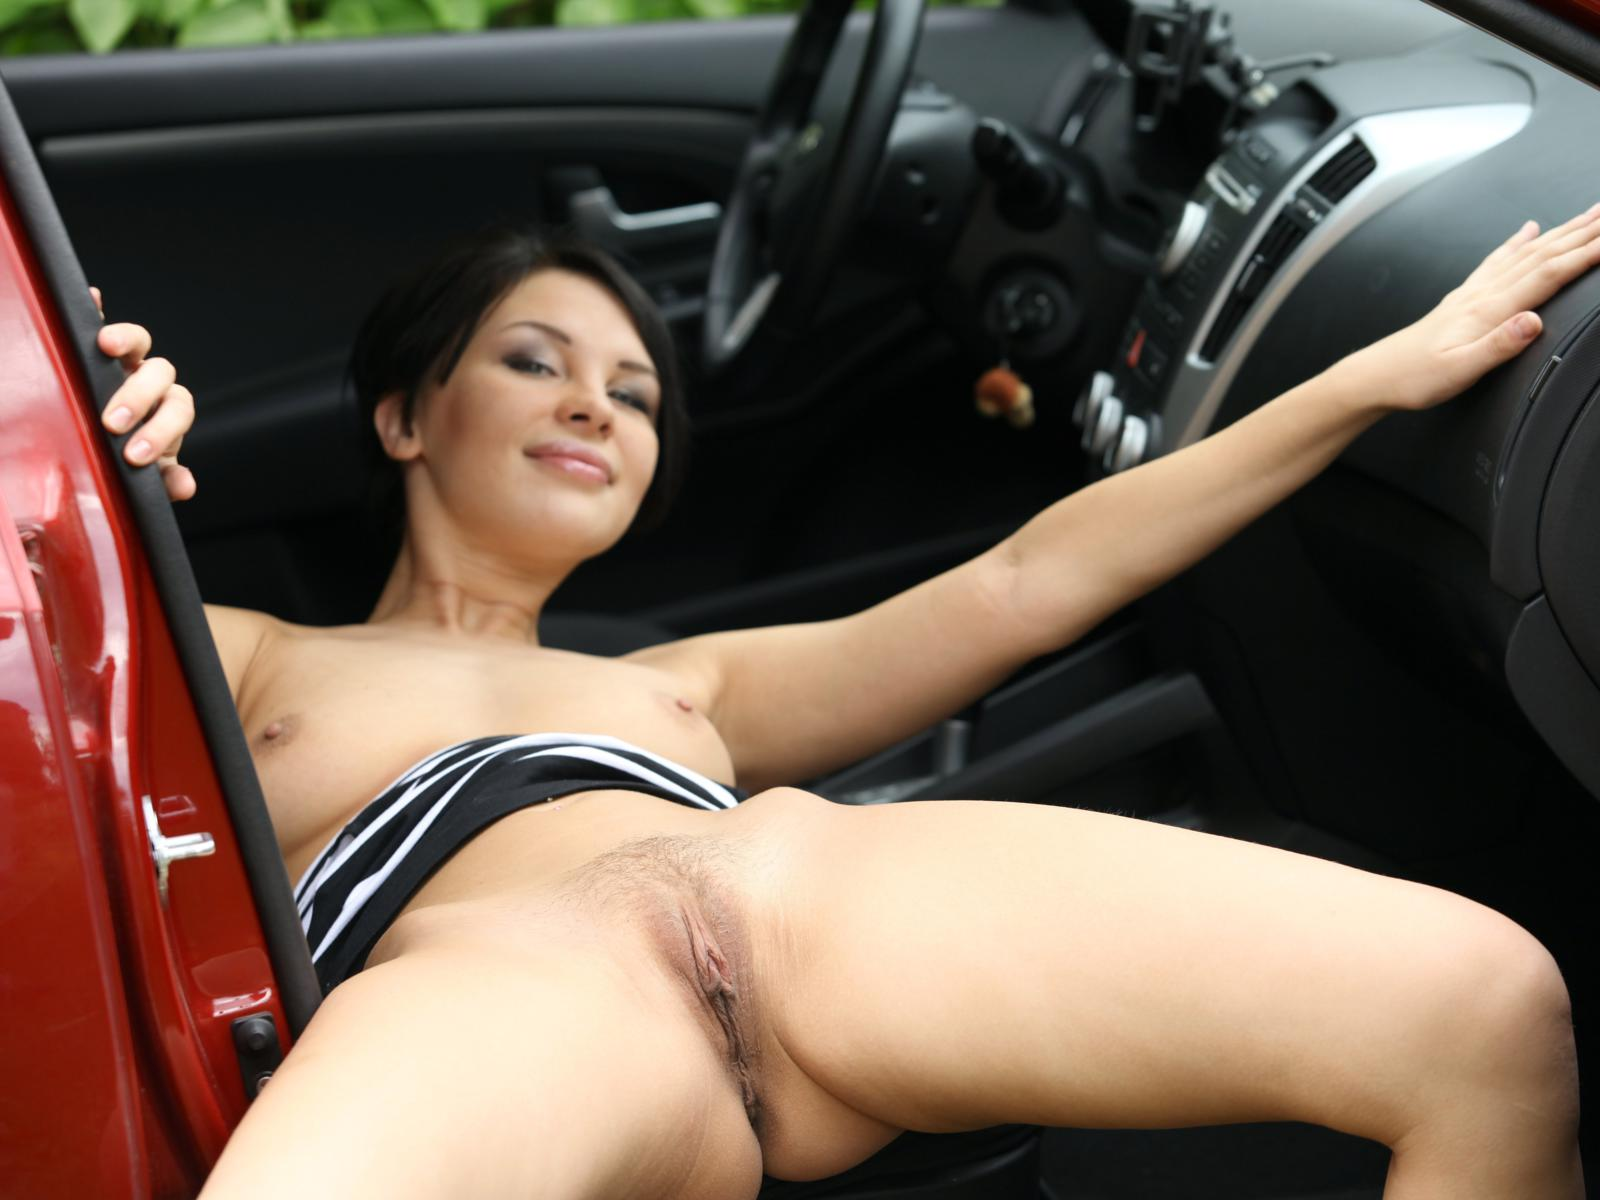 image Cum on sexy milf amateur parking ga dates25co